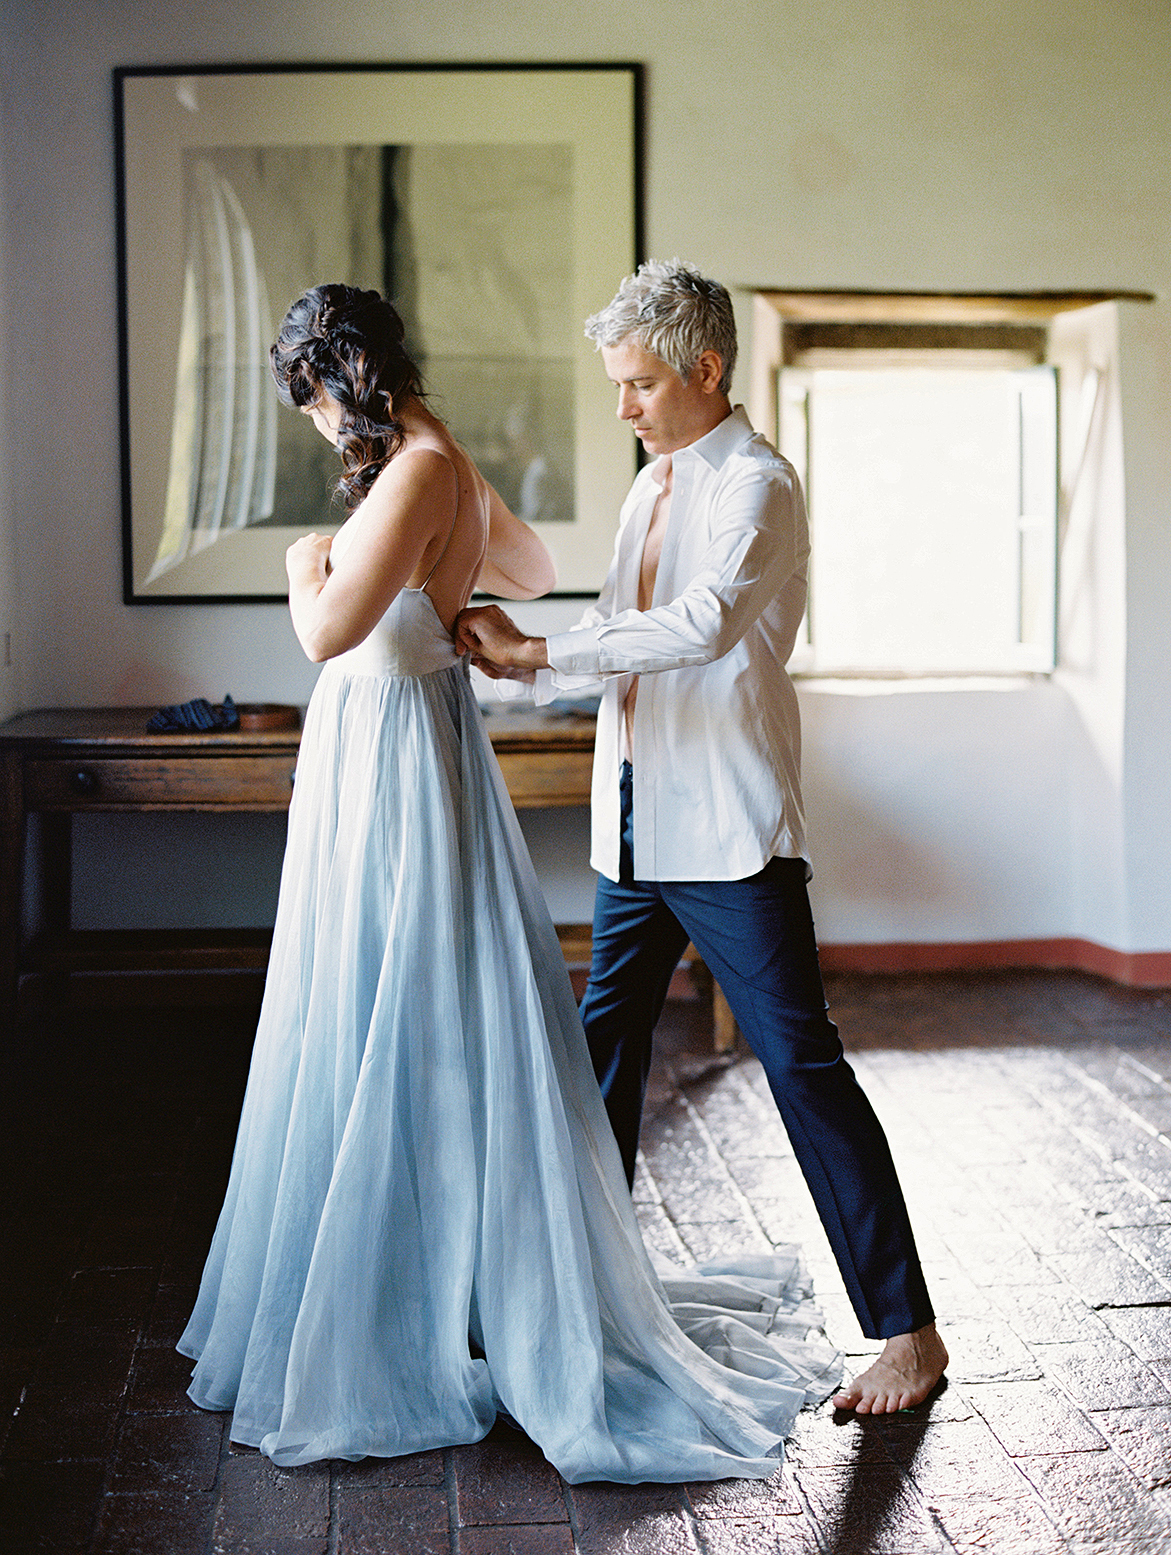 kelly pete wedding groom helping bride with dress